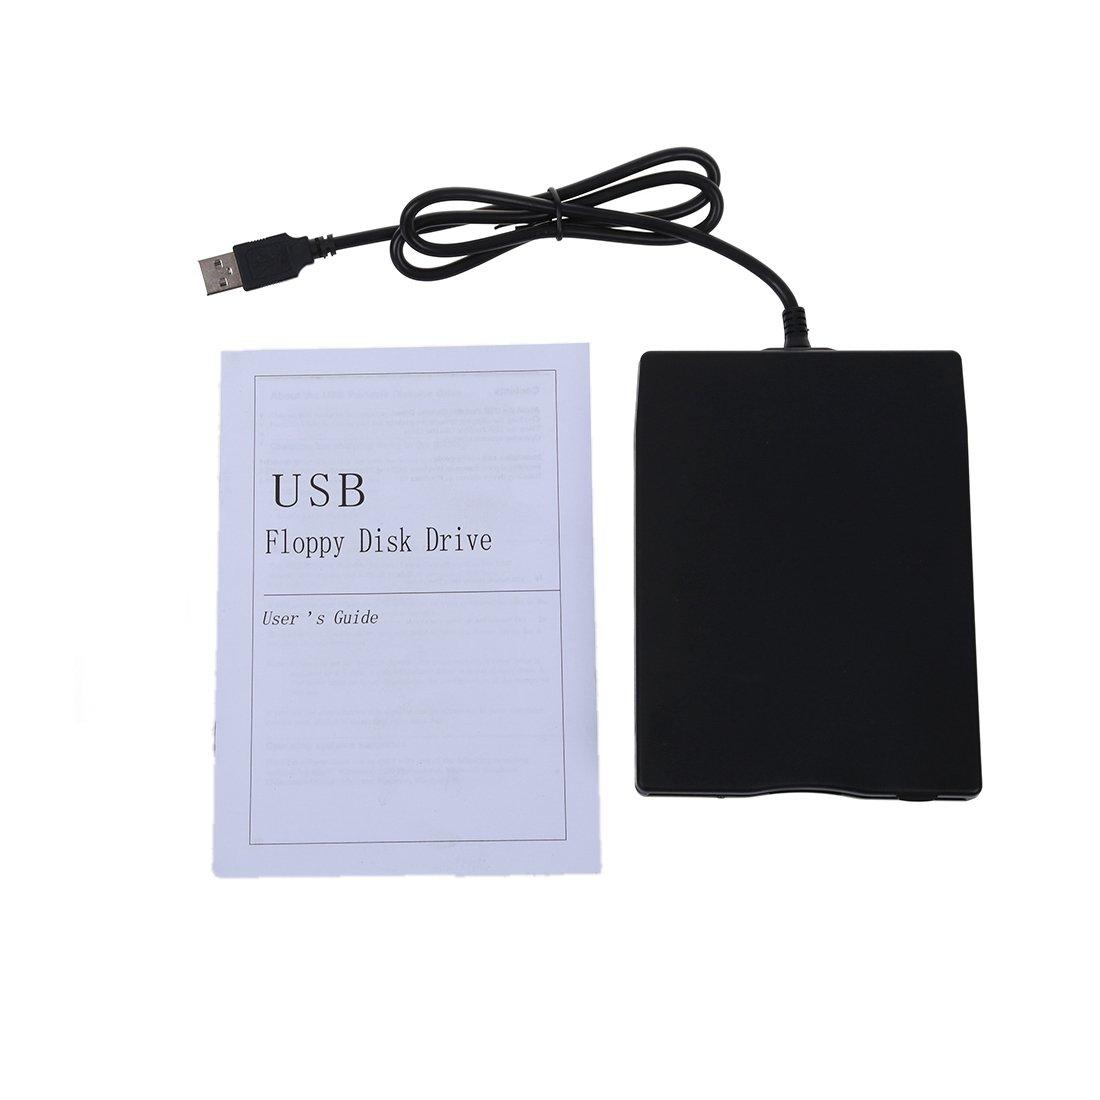 SODIAL(R)Durable USB 2.0 external 3.5-inch 1.44 MB Floppy